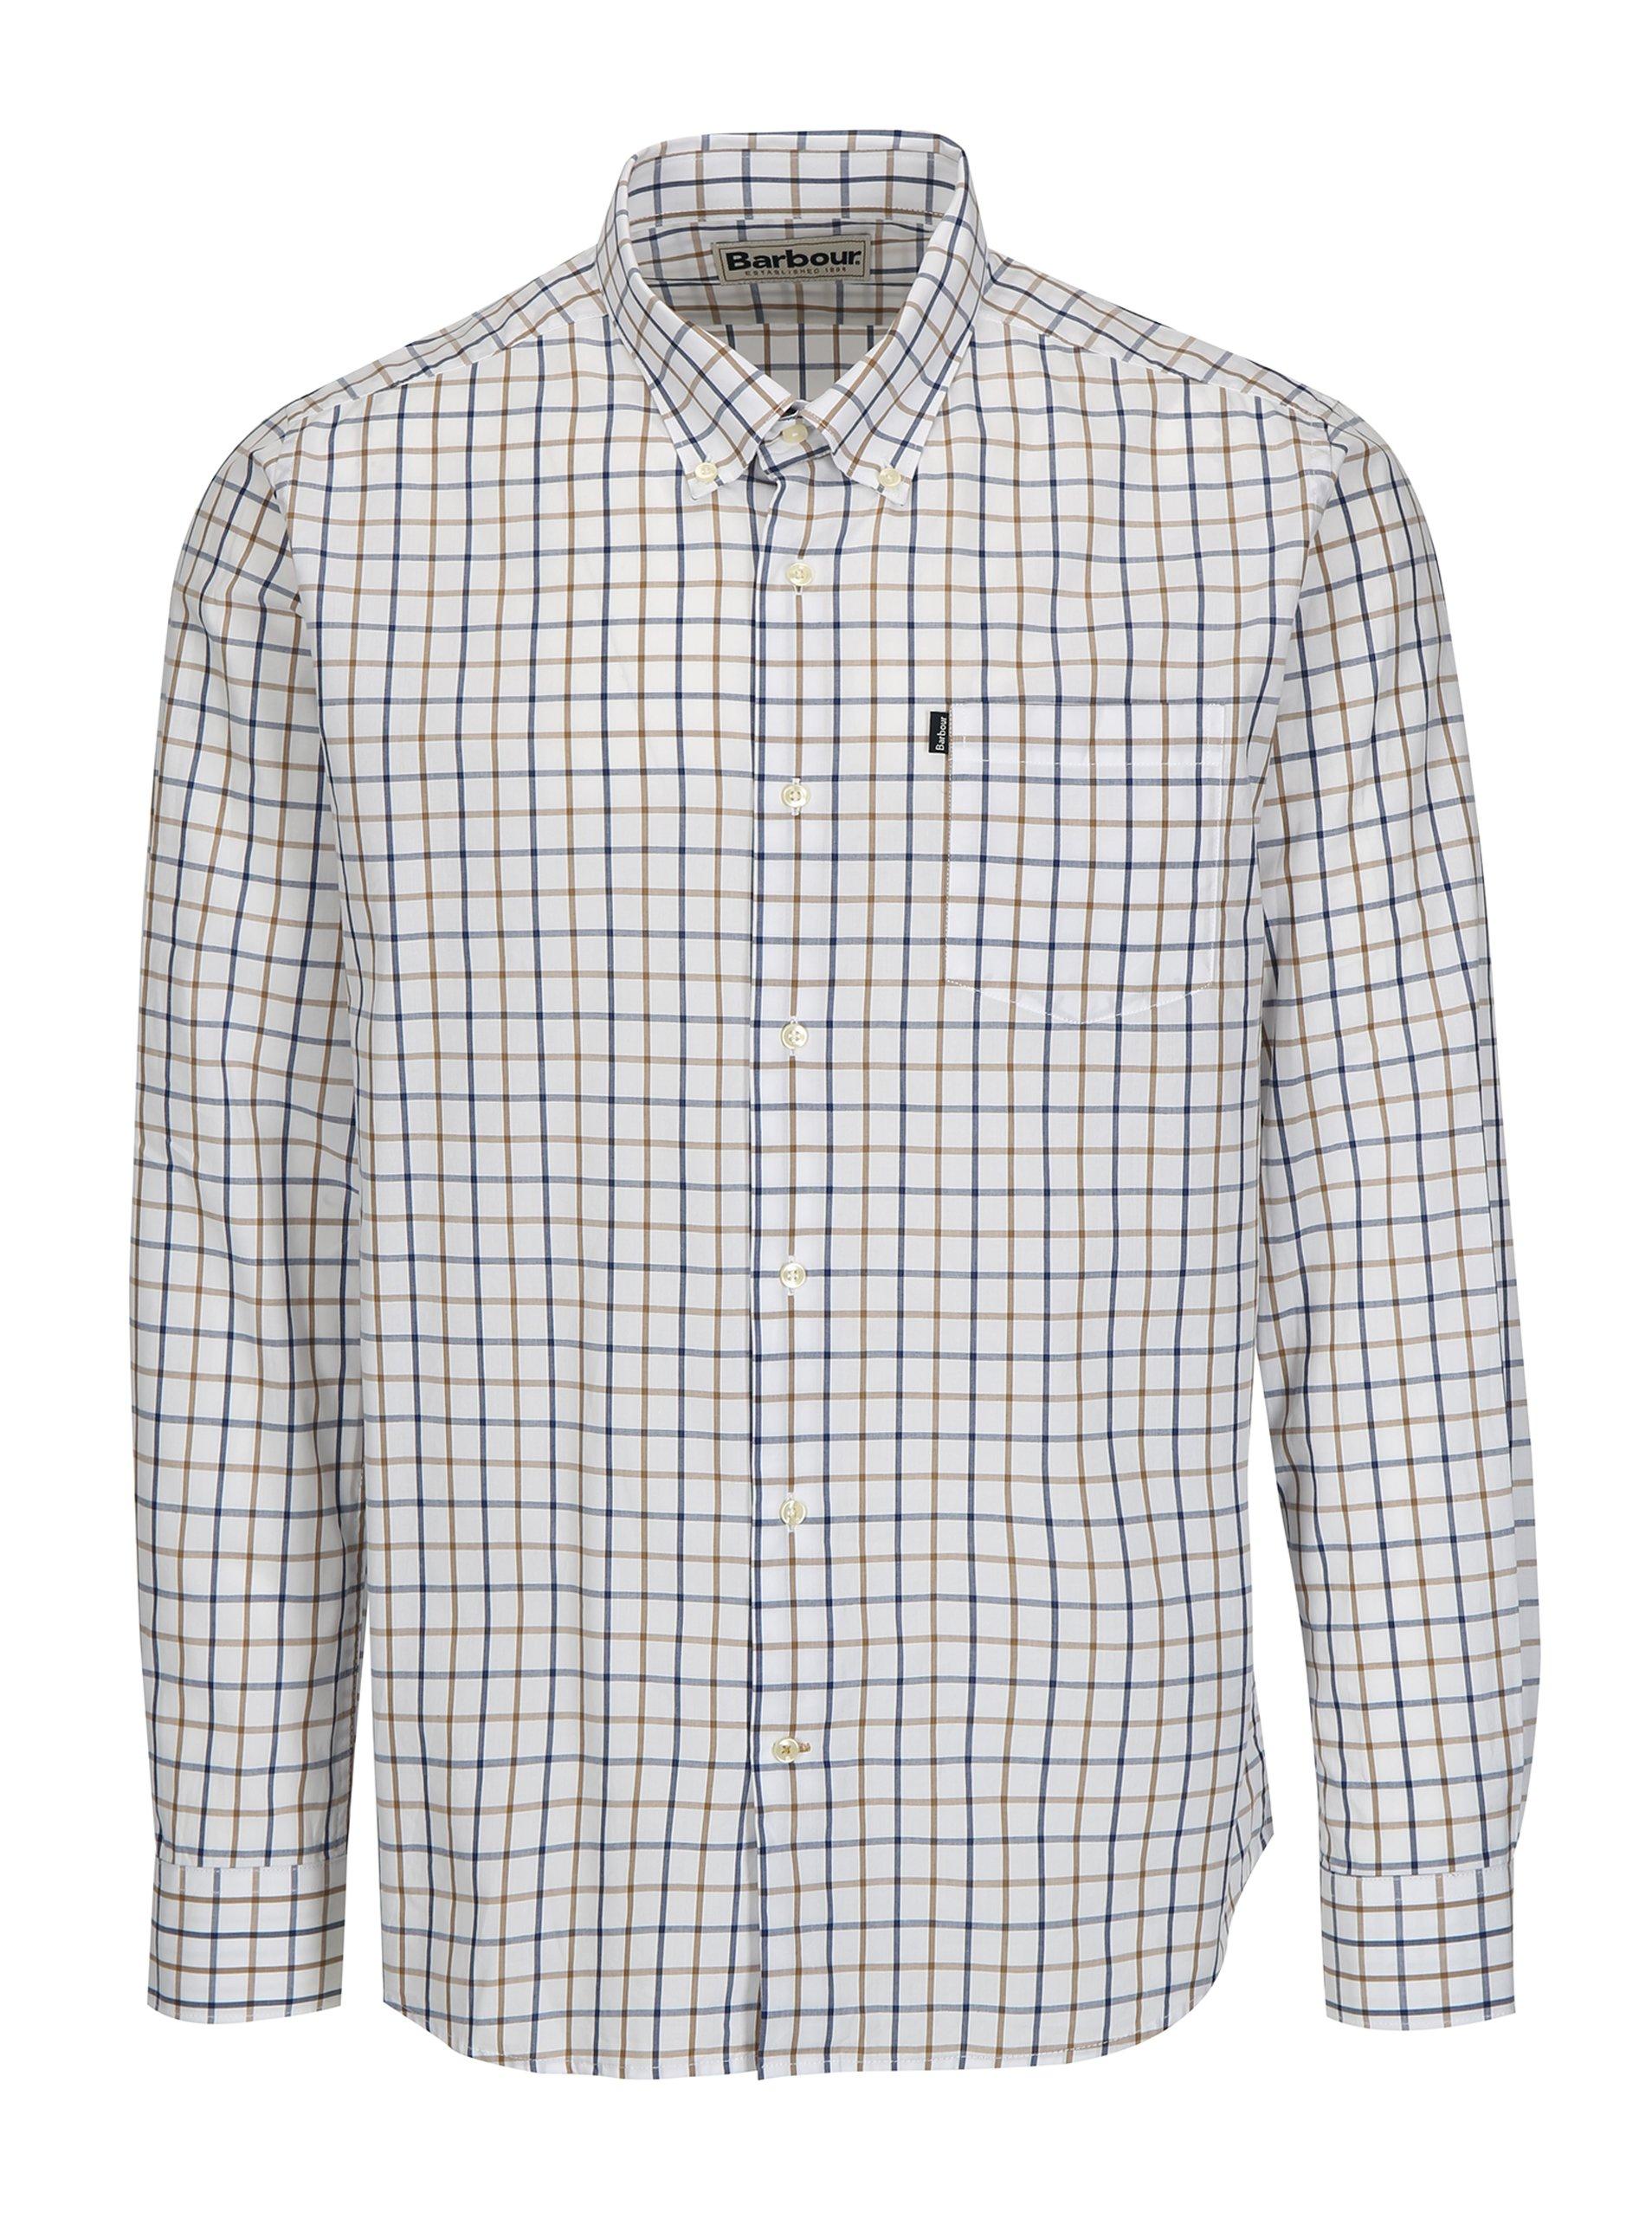 Modro-bílá kostkovaná tailored fit košile Barbour Henry 8f1c4153ea